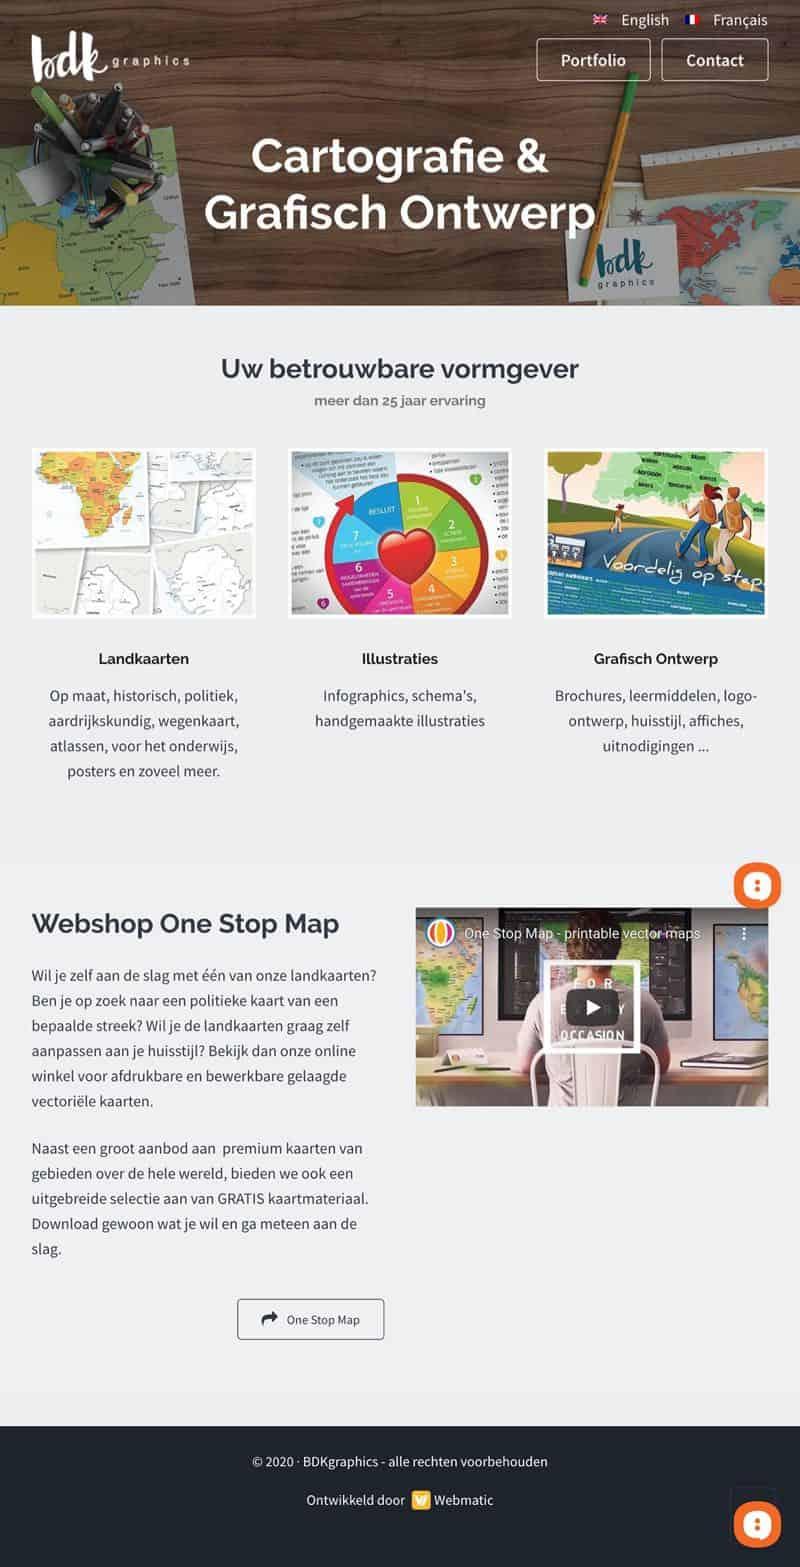 webmatic-portfolio-bdkgraphics-2246-800